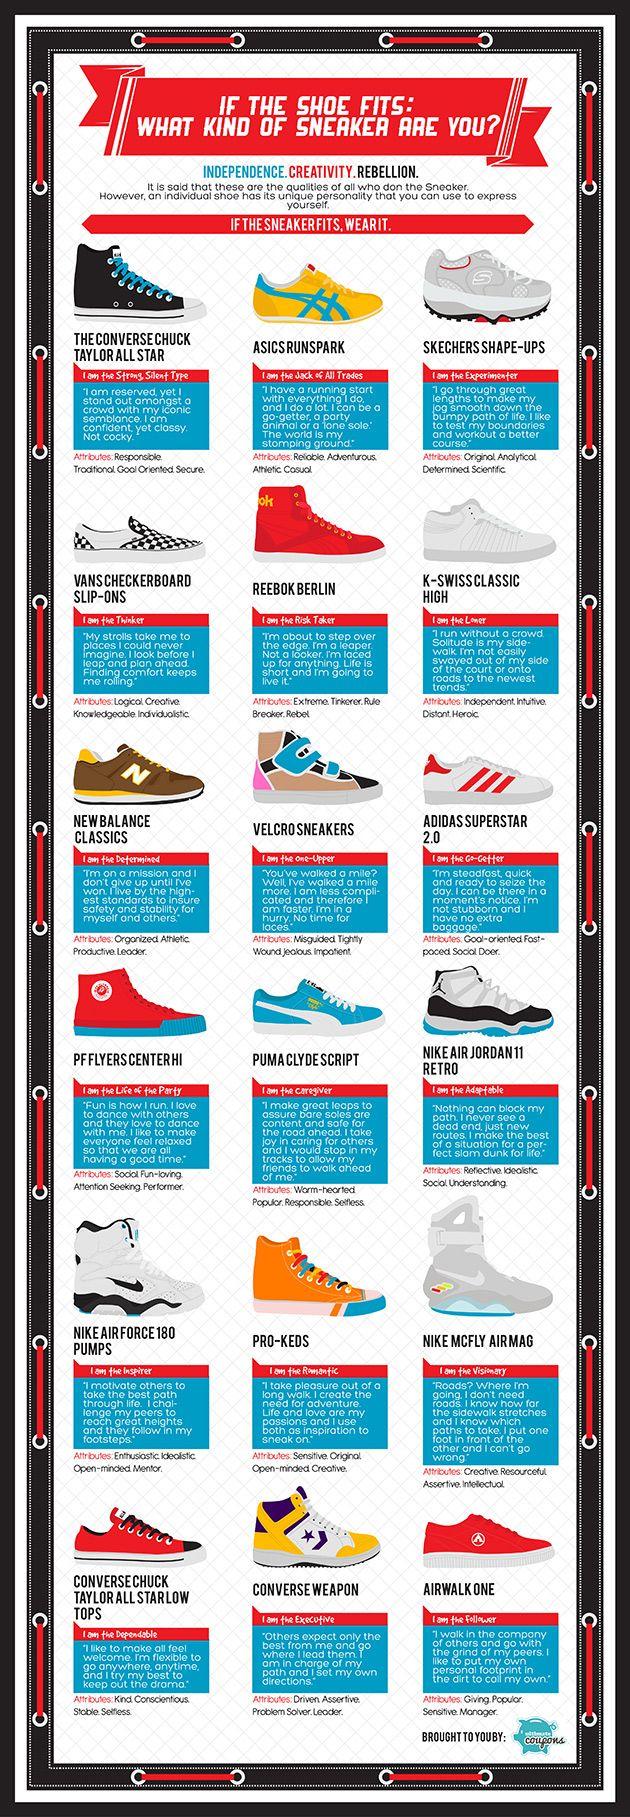 Briefmarken – Schuhe Sammelleidenschaft als Sneaker Freaker tsxChrdQ